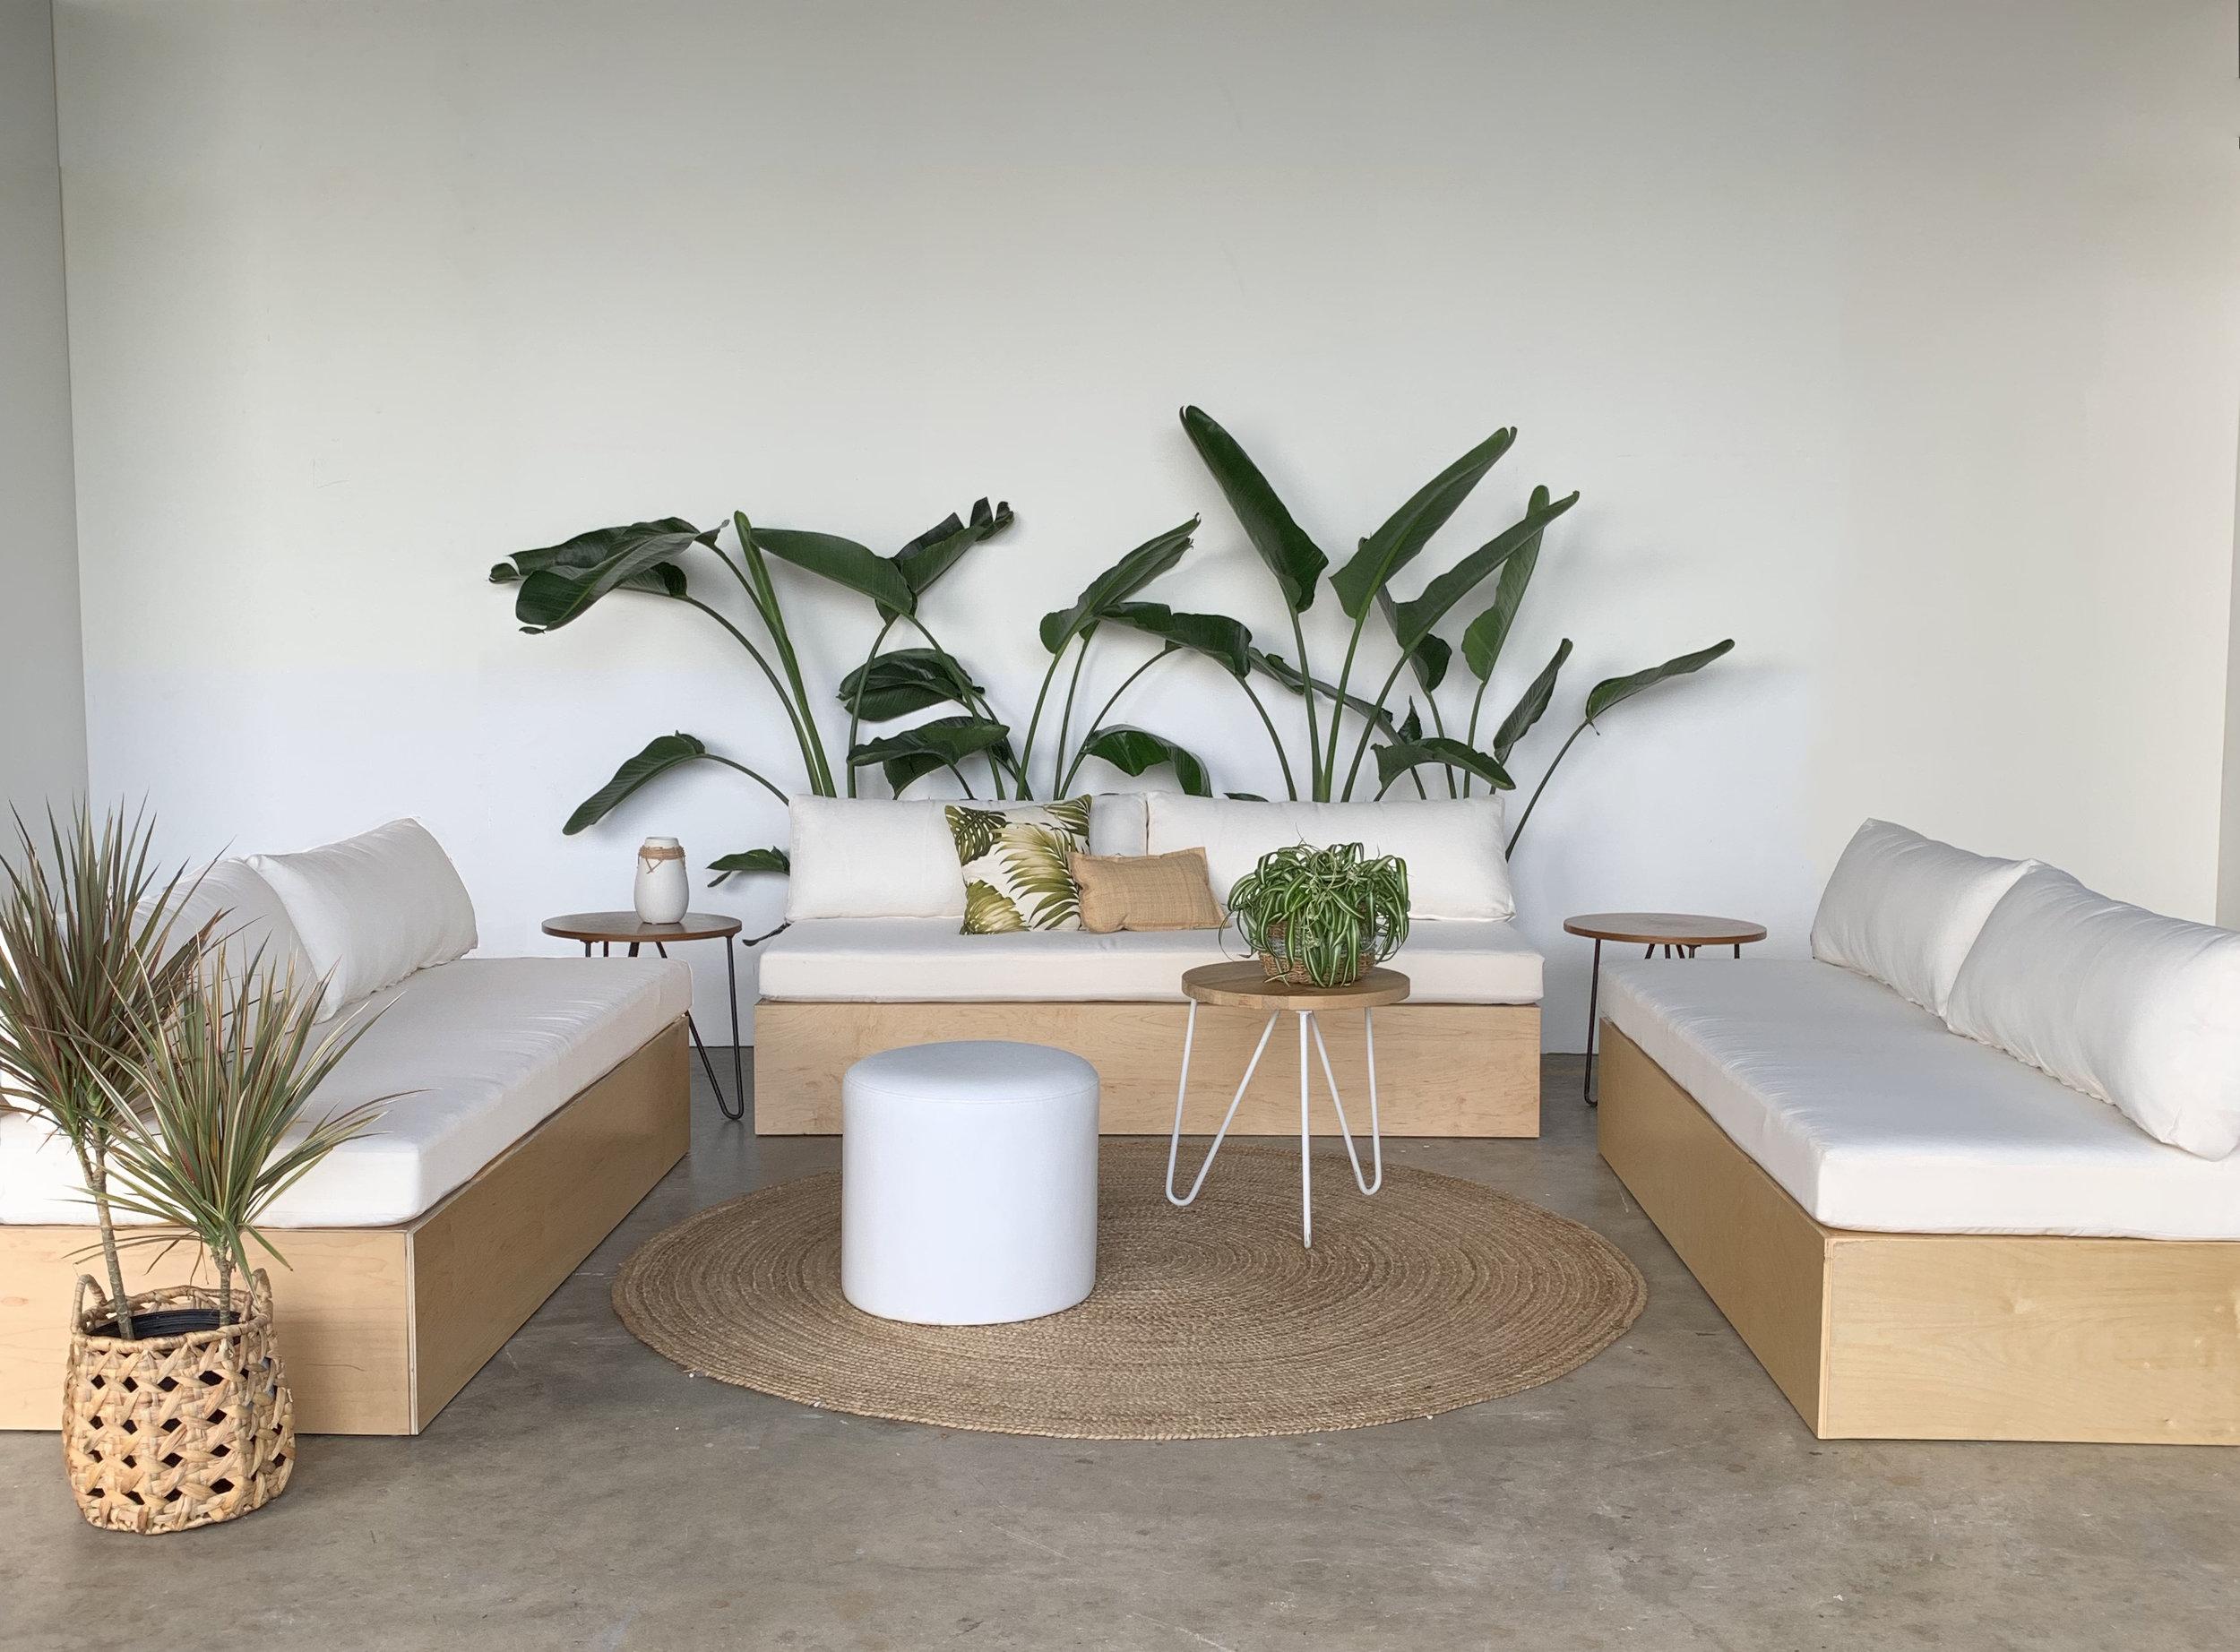 Ronen-Rentalmeadow-sofa-white.jpg